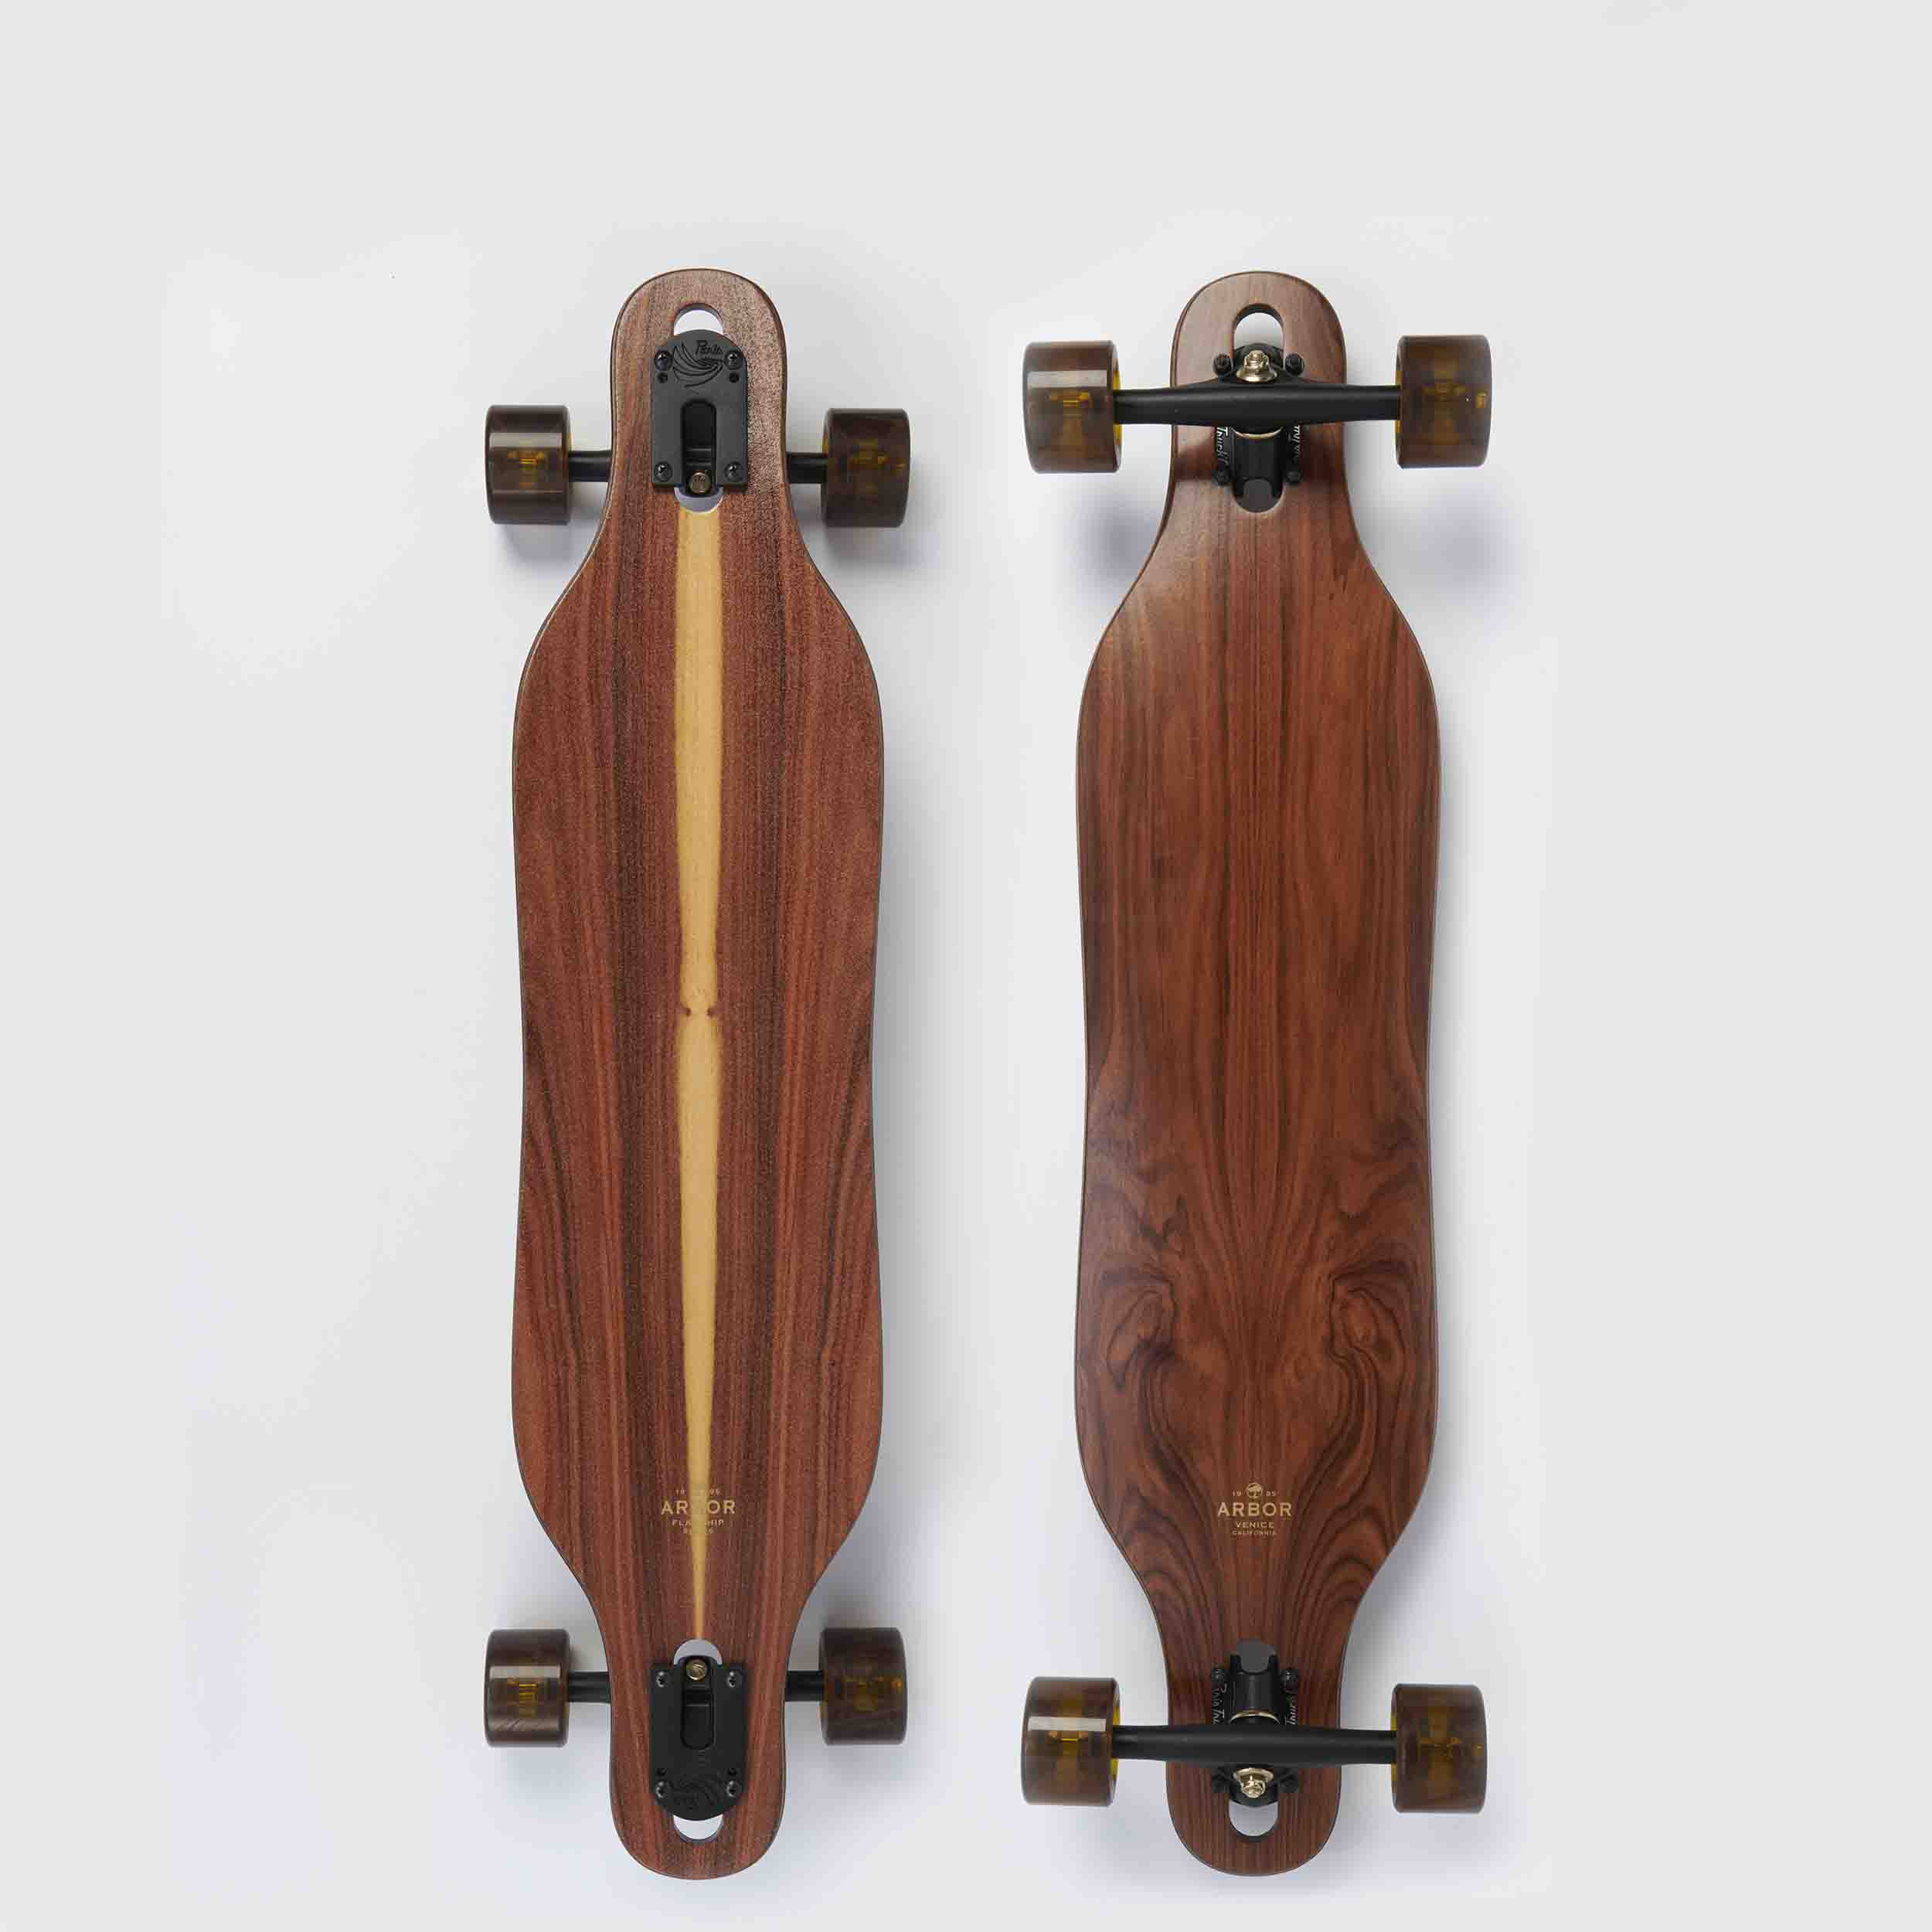 Arbor 2021 Longboards